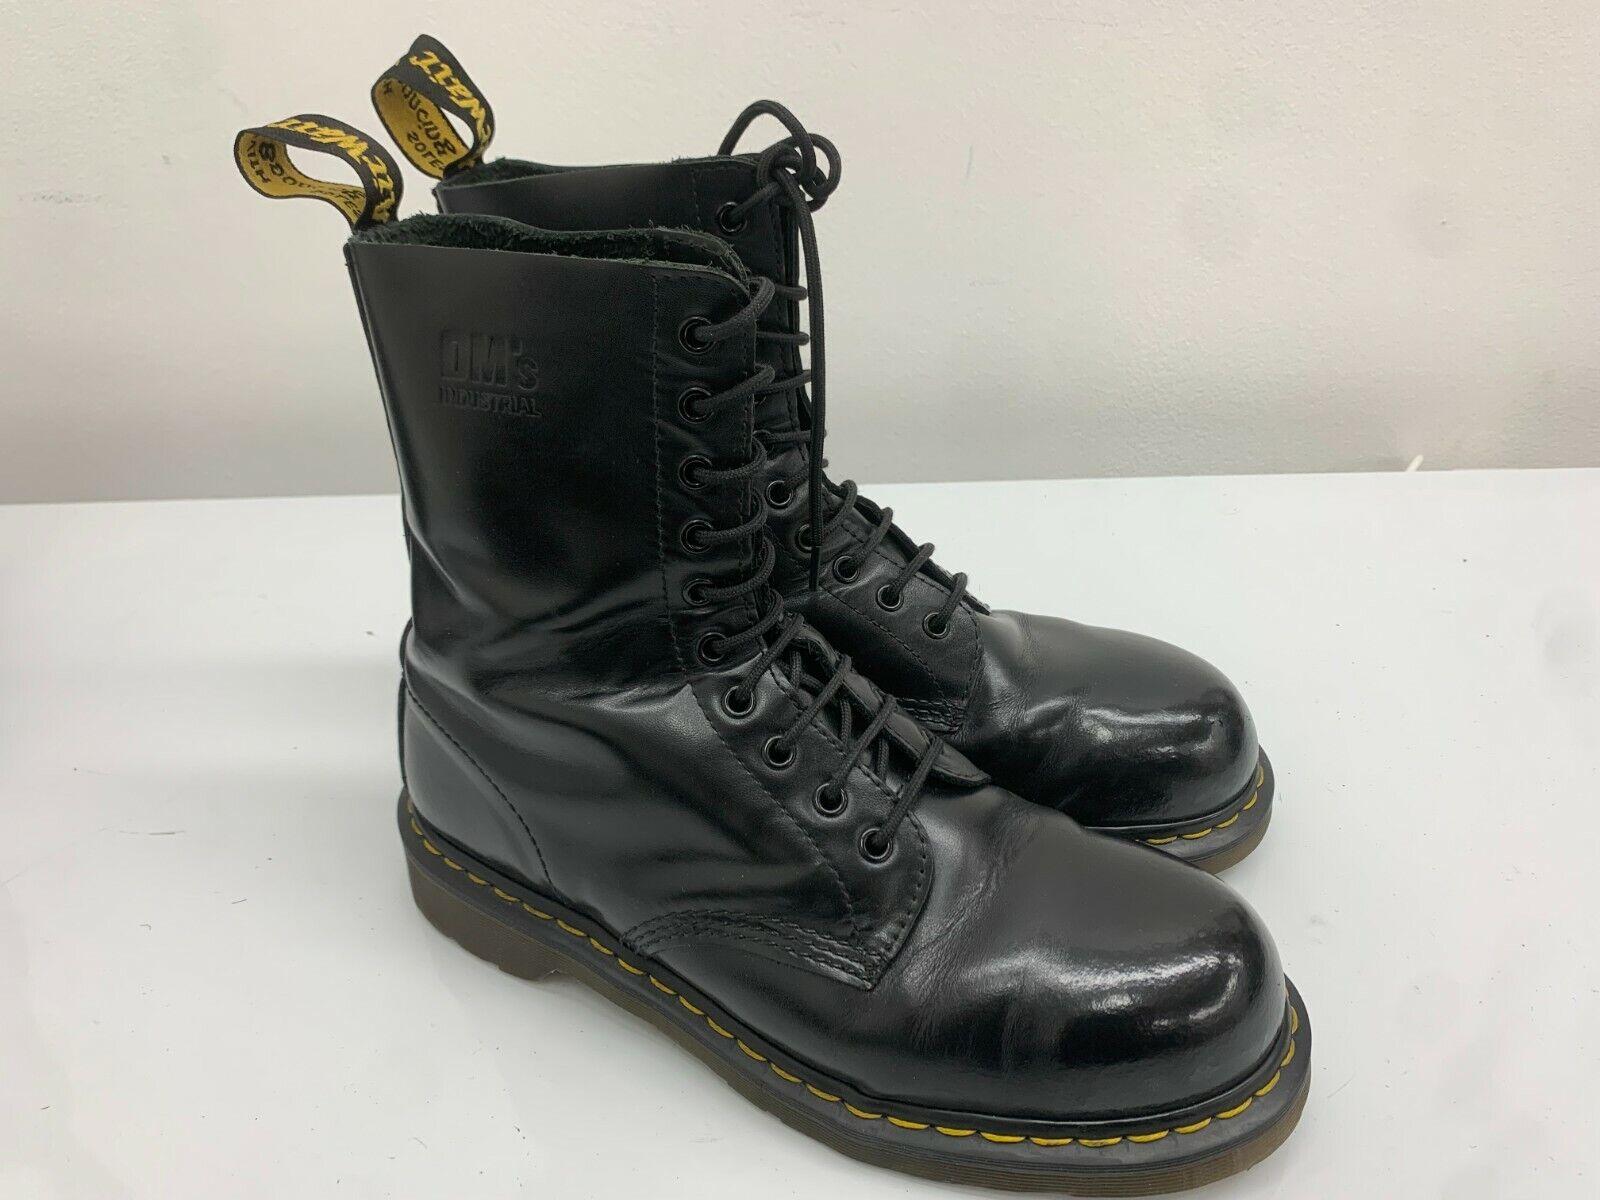 Dr Martens Boots, Black, Size 9UK, 10 Eyelet, Steel Toe Cap Docs Shiny DM's